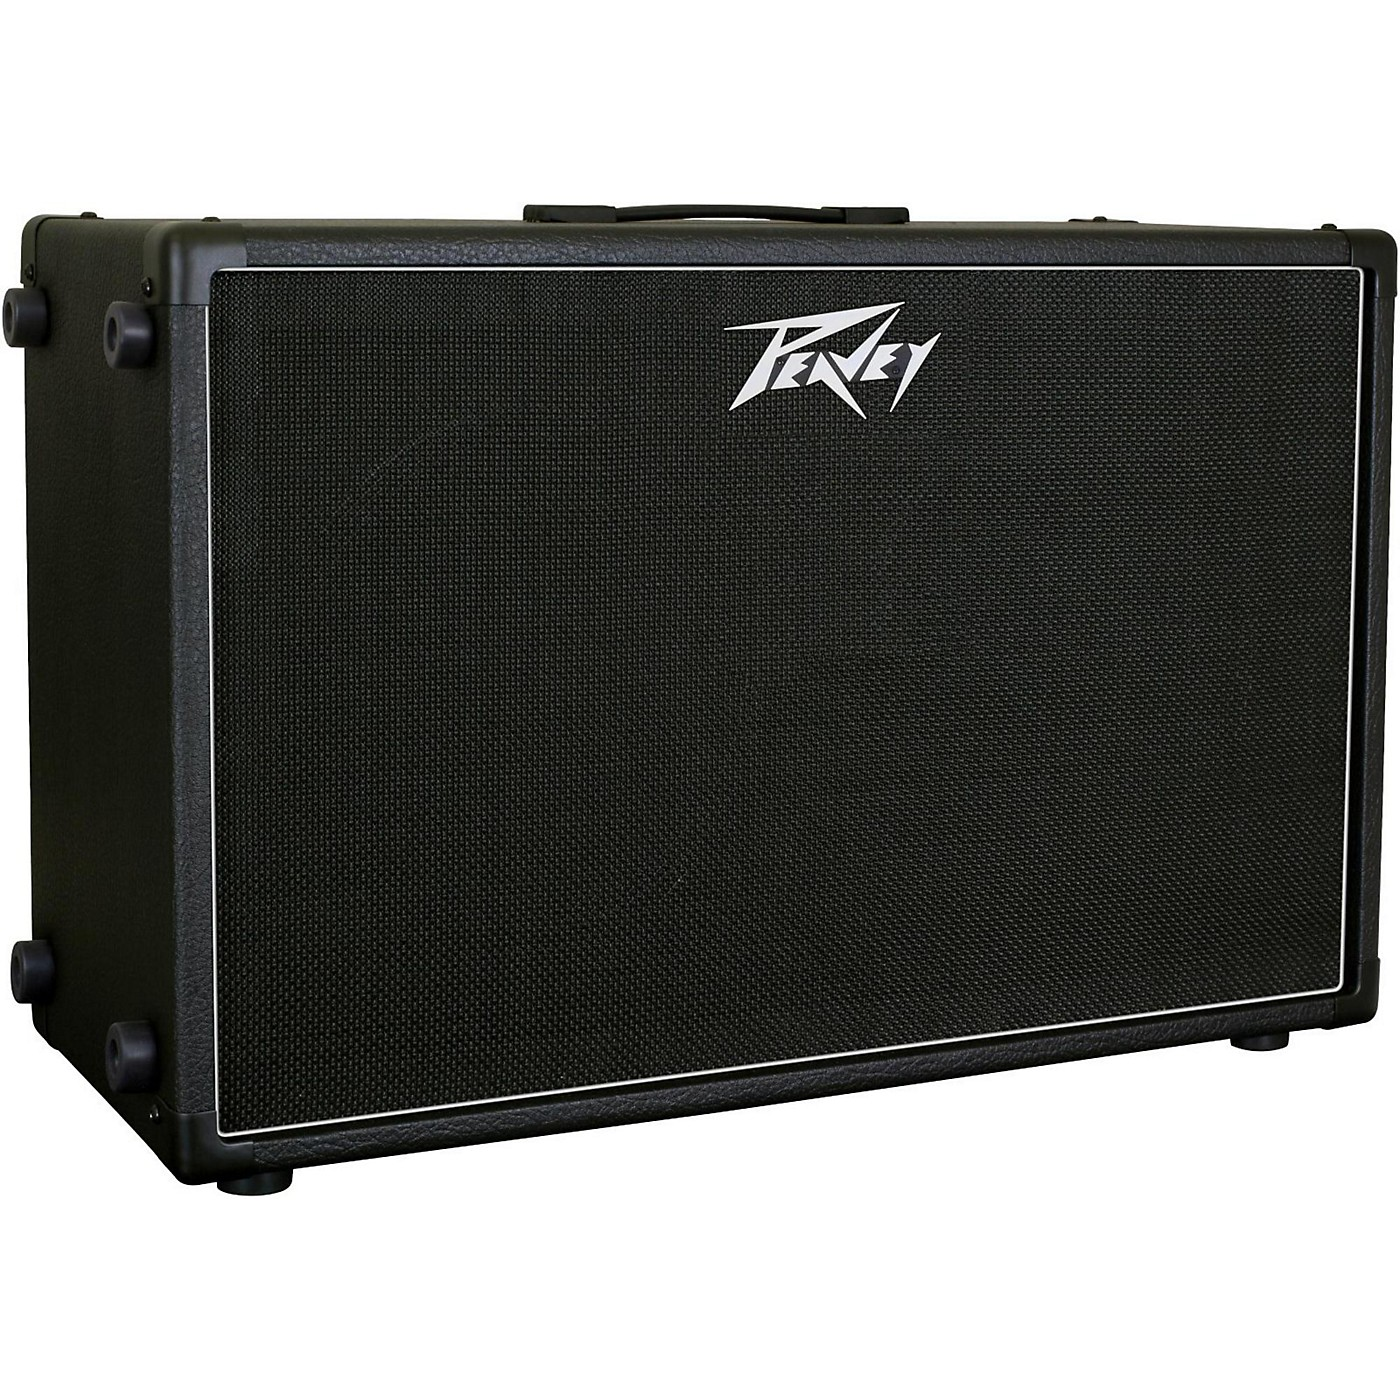 Peavey 212-6 50W 2x12 Guitar Speaker Cabinet thumbnail